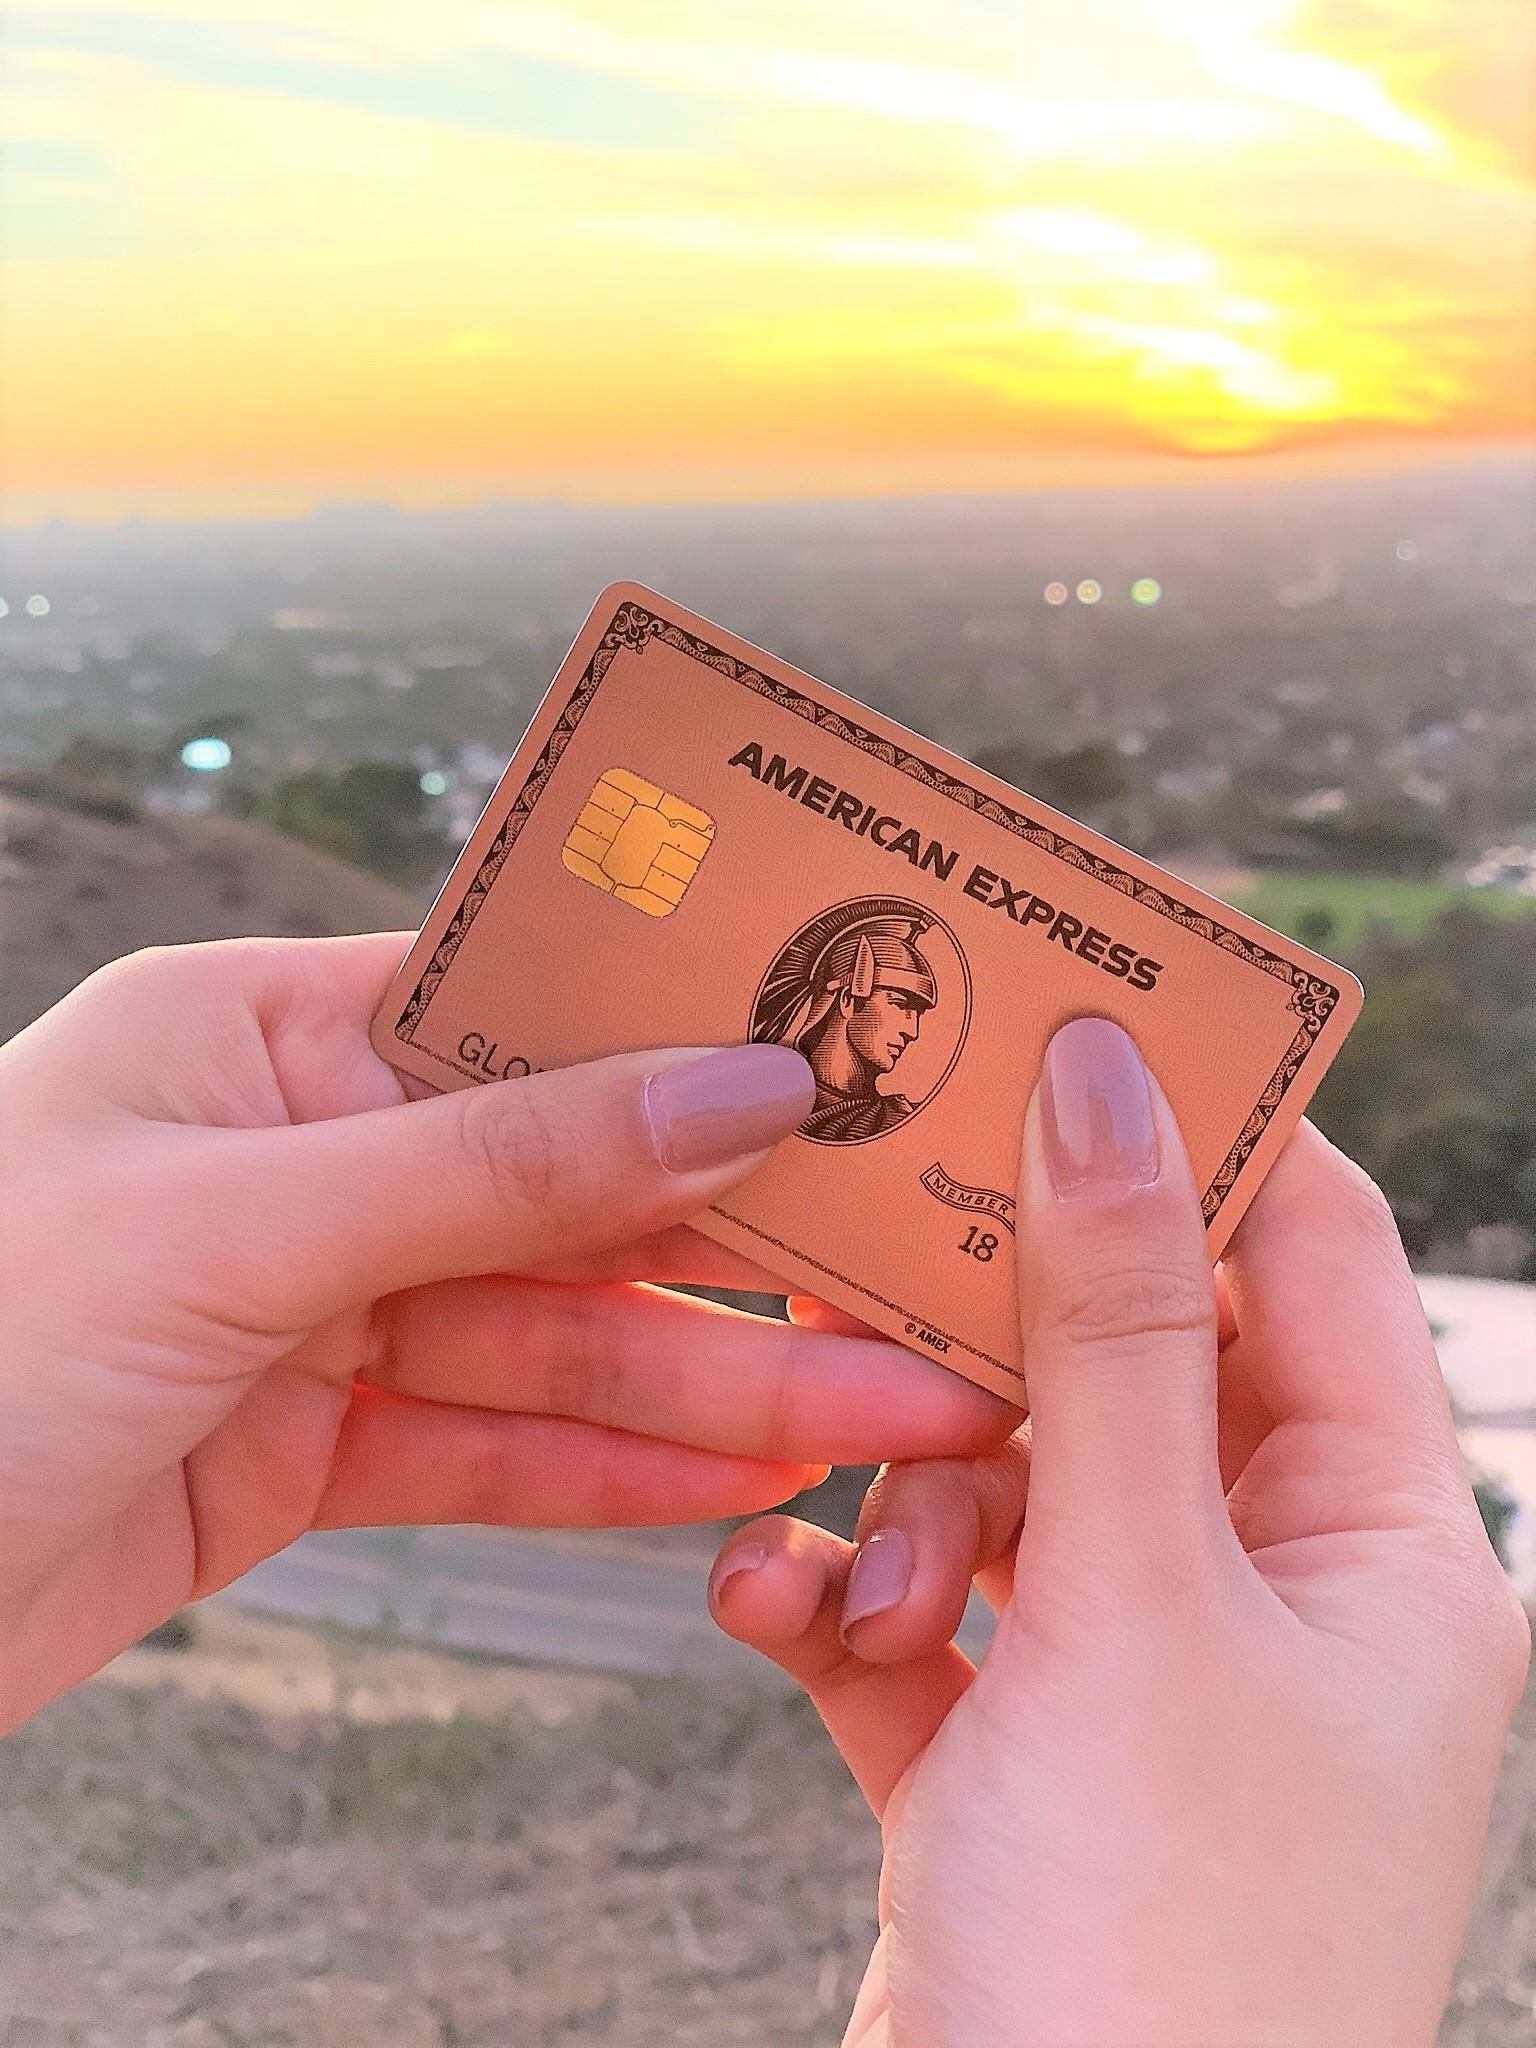 american express rose gold premier credit card